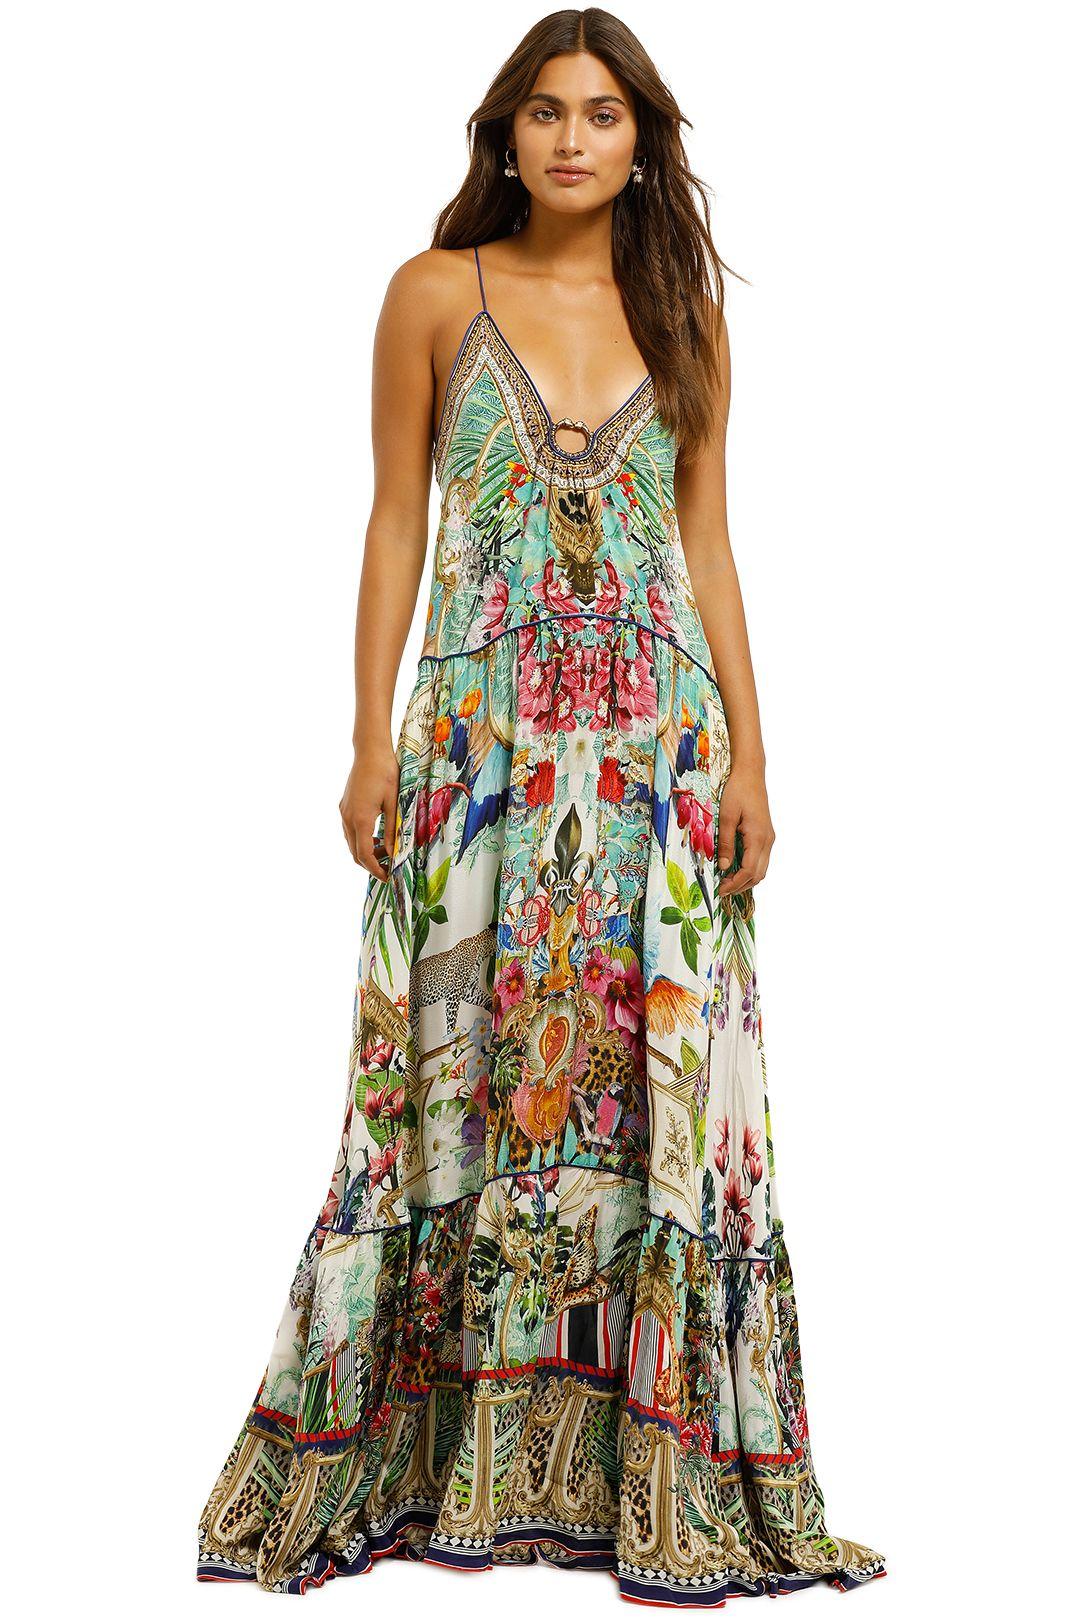 Camilla-U-Ring-Maxi-Dress-Champagne-Coast-Front